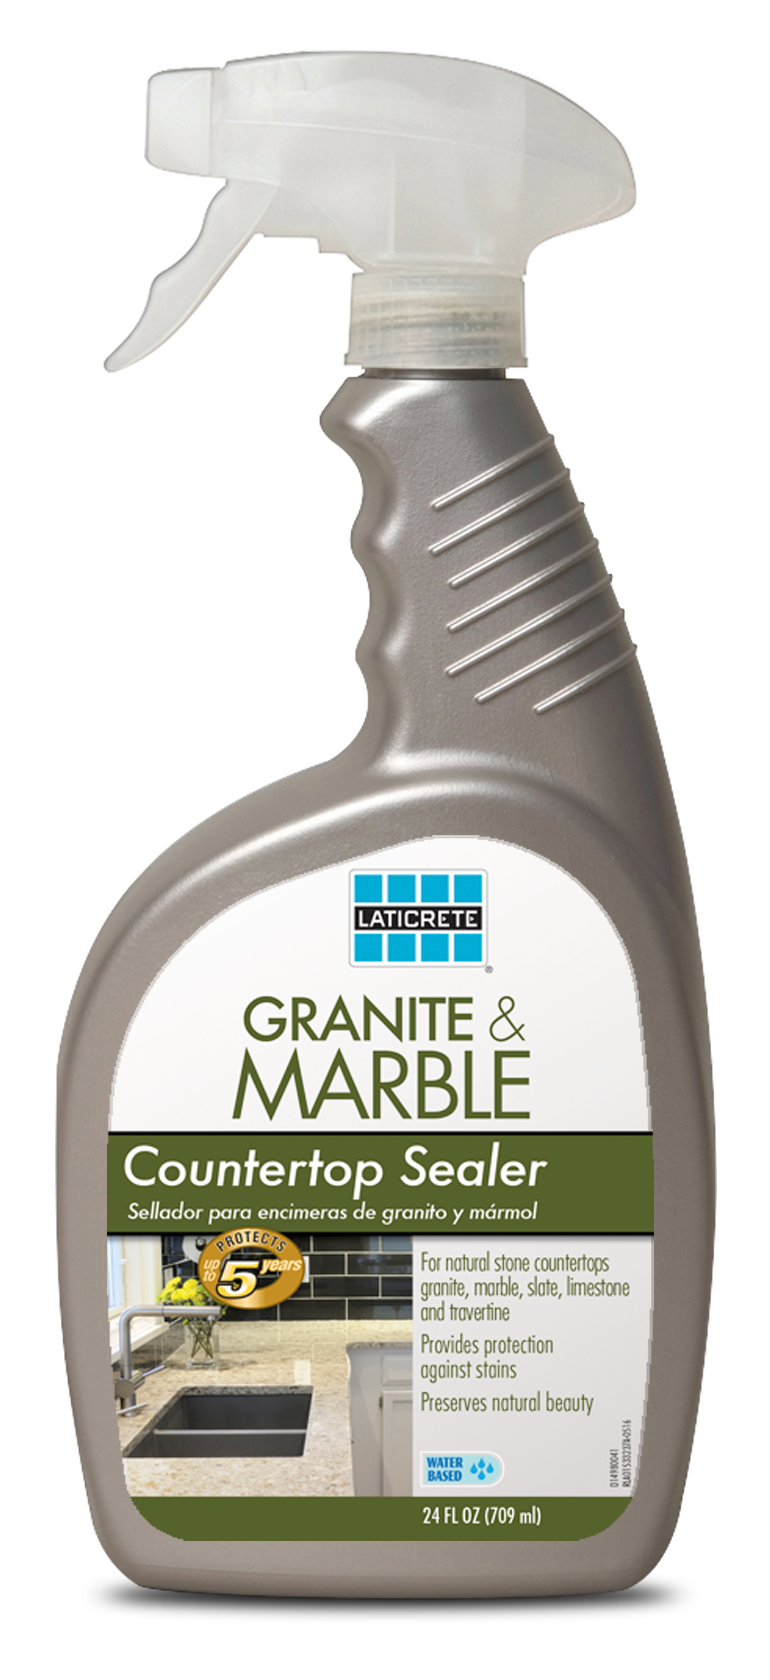 LATICRETE Granite & Marble Countertop Sealer